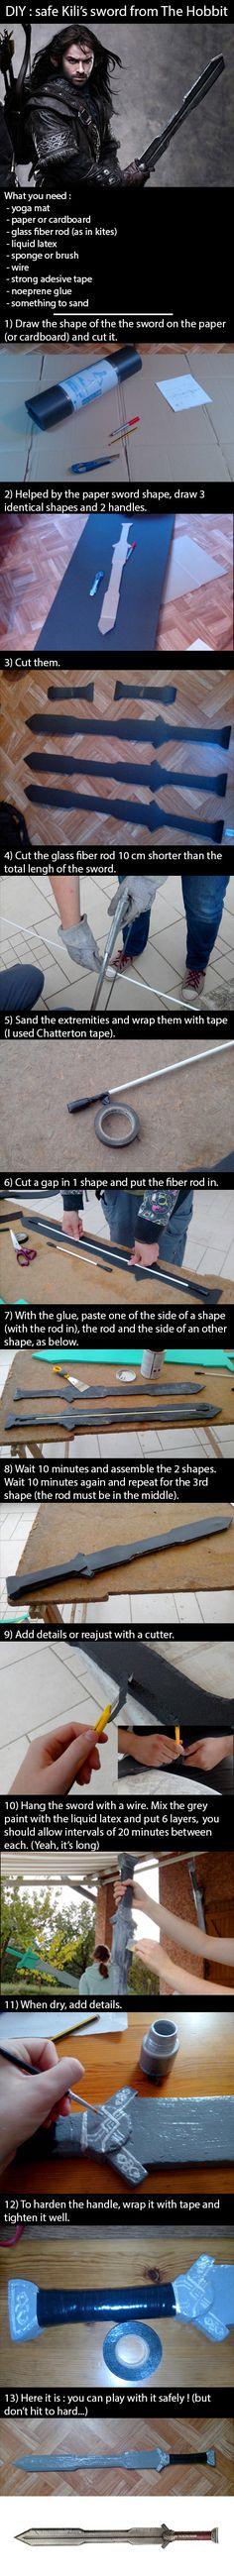 DIY : Kili's sword from The Hobbit by MojulineLC.deviantart.com Easy tutorial !